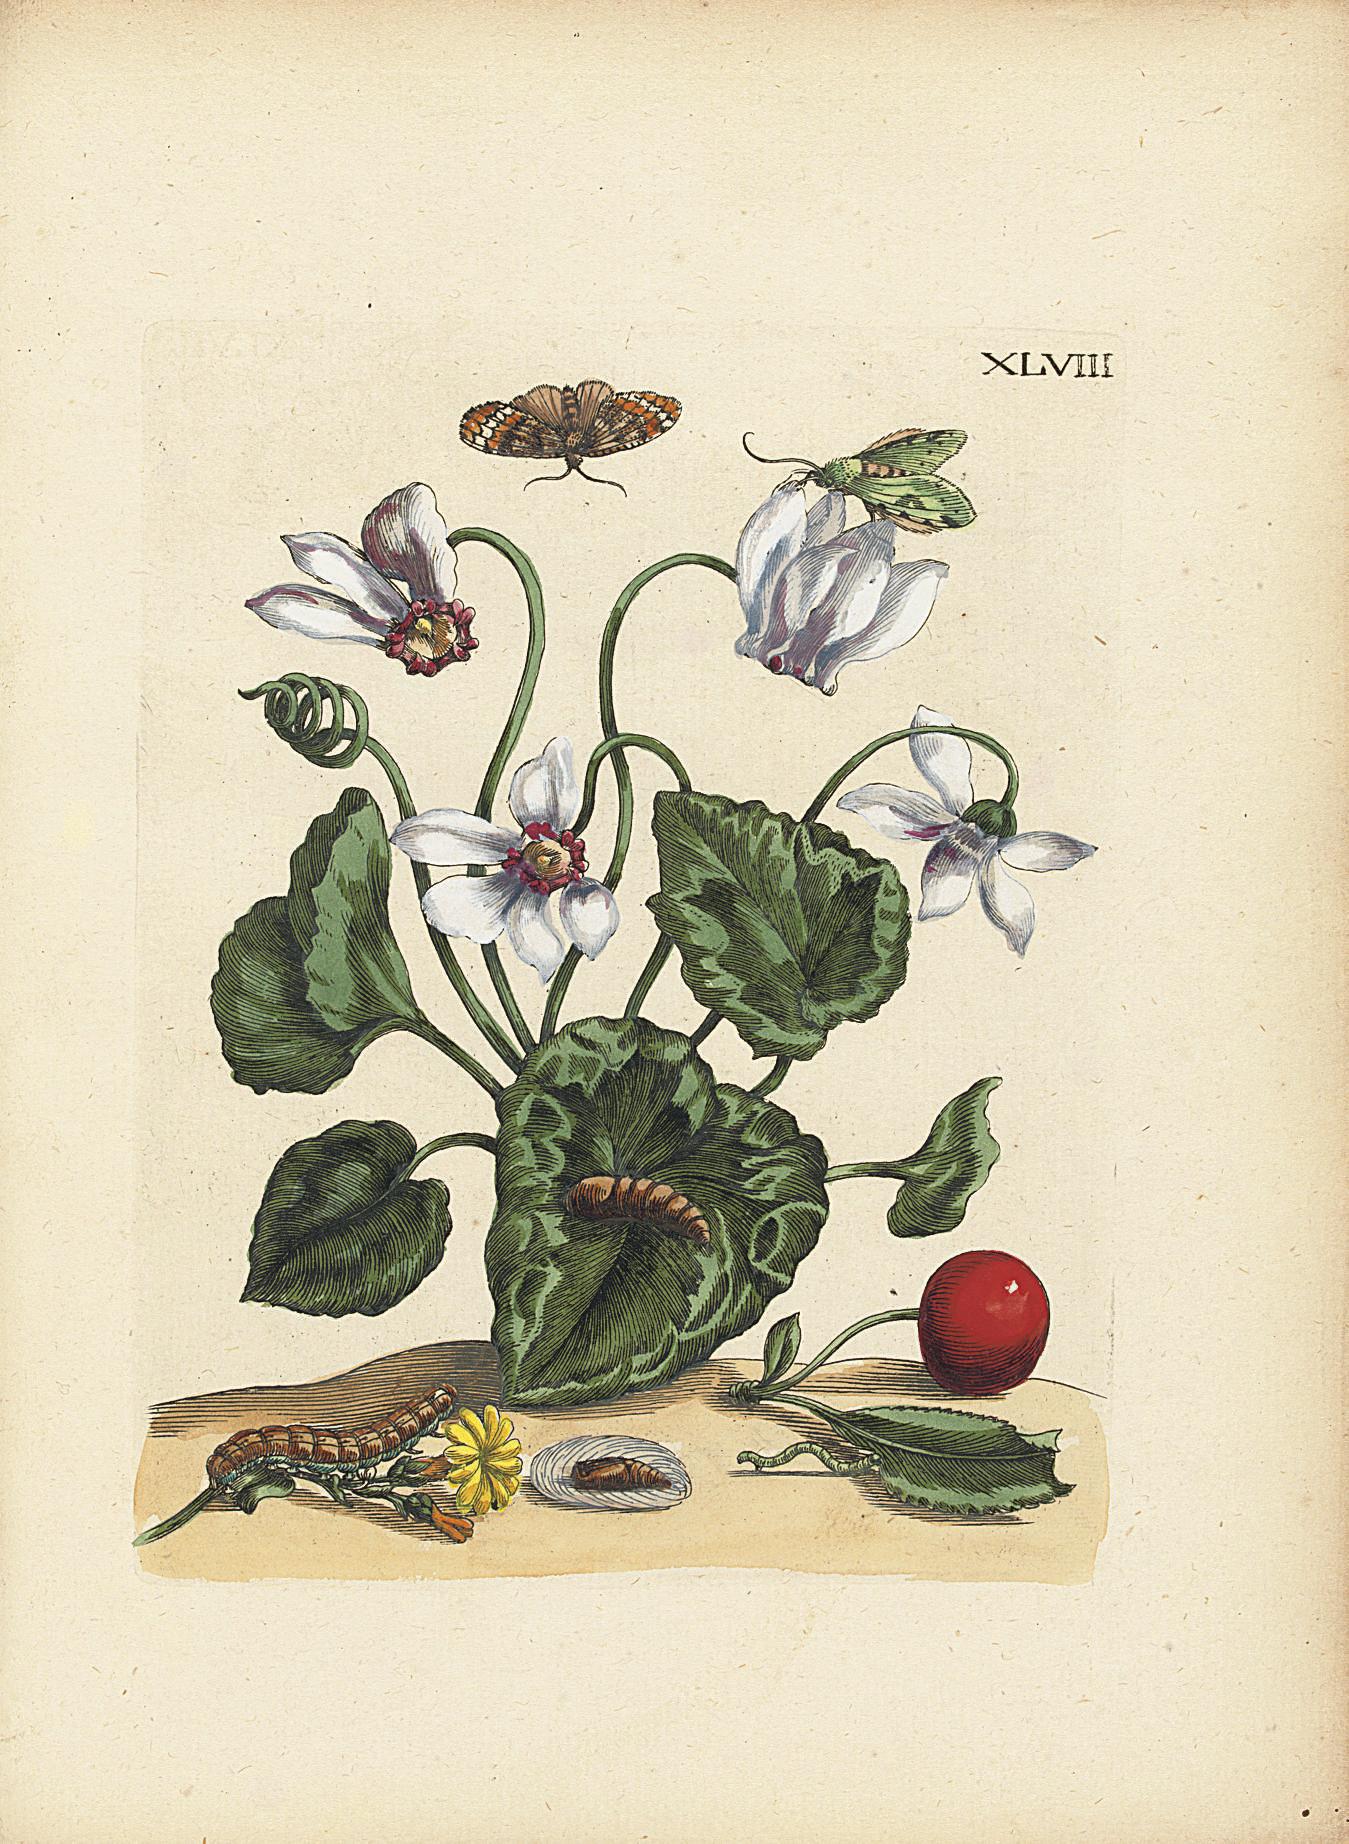 MERIAN, Maria Sibylla (1647-1717). Erucarum ortus, alimentum et paradoxa metamorphosis. Amsterdam: Johannes Oosterwijk, [1718].